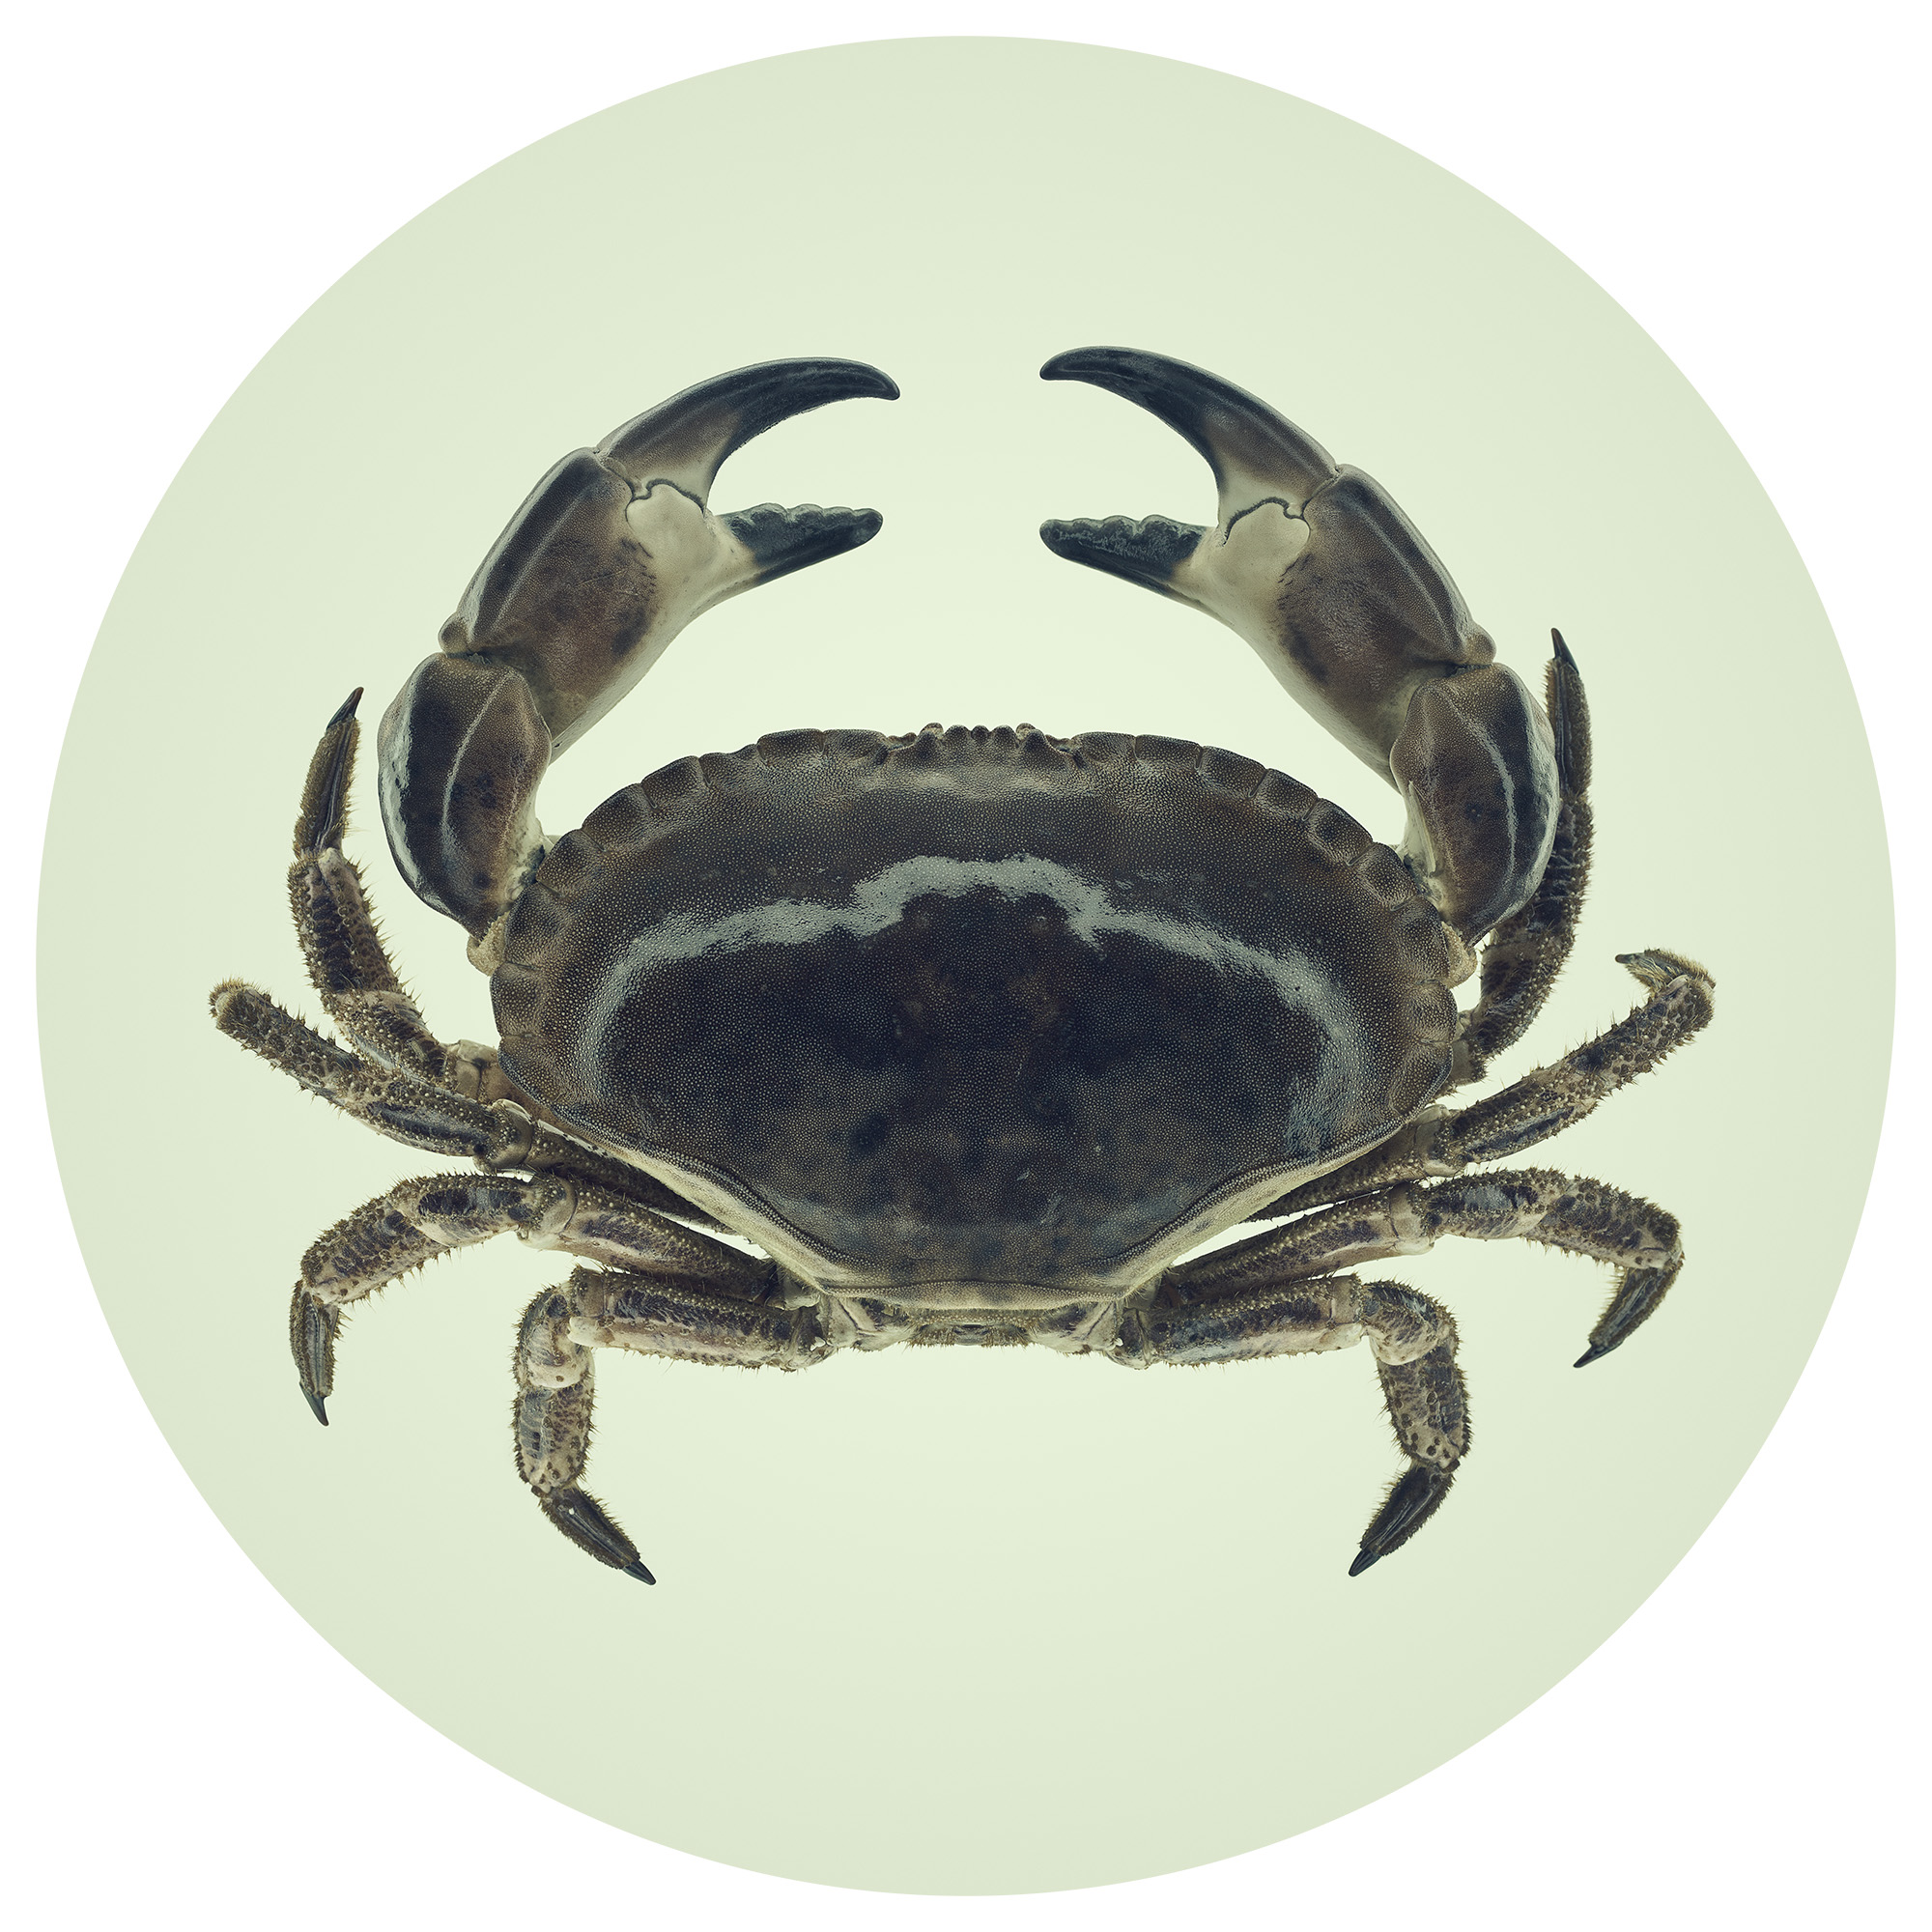 LITEMATTER - Crab 1